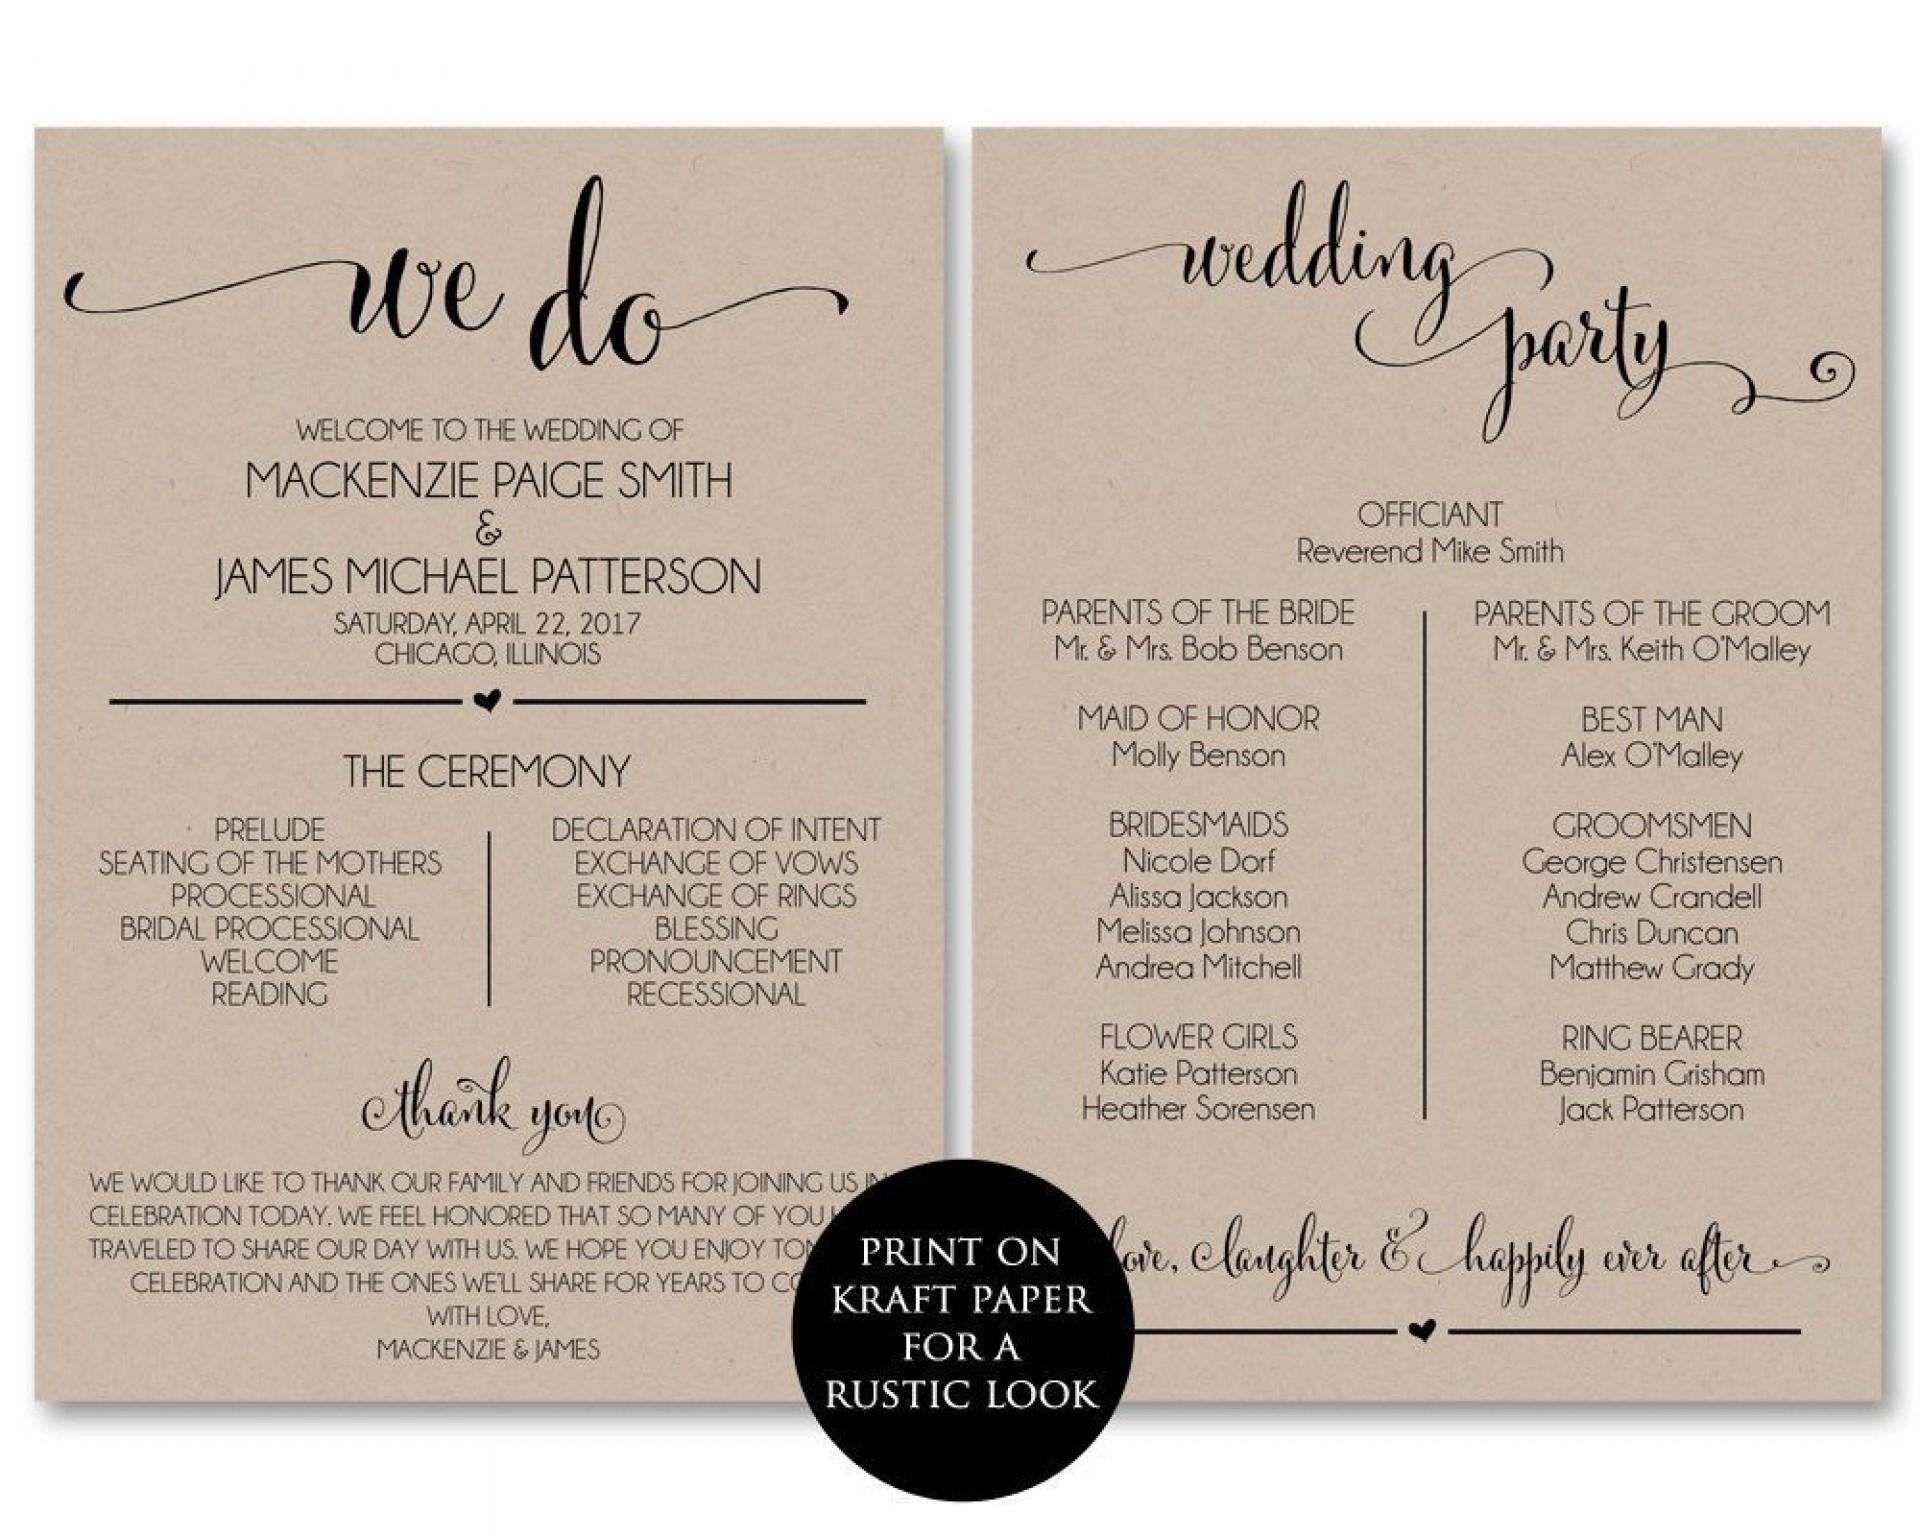 002 Impressive Wedding Program Template Free Download Idea  Downloadable Fan Microsoft Word Printable Editable1920